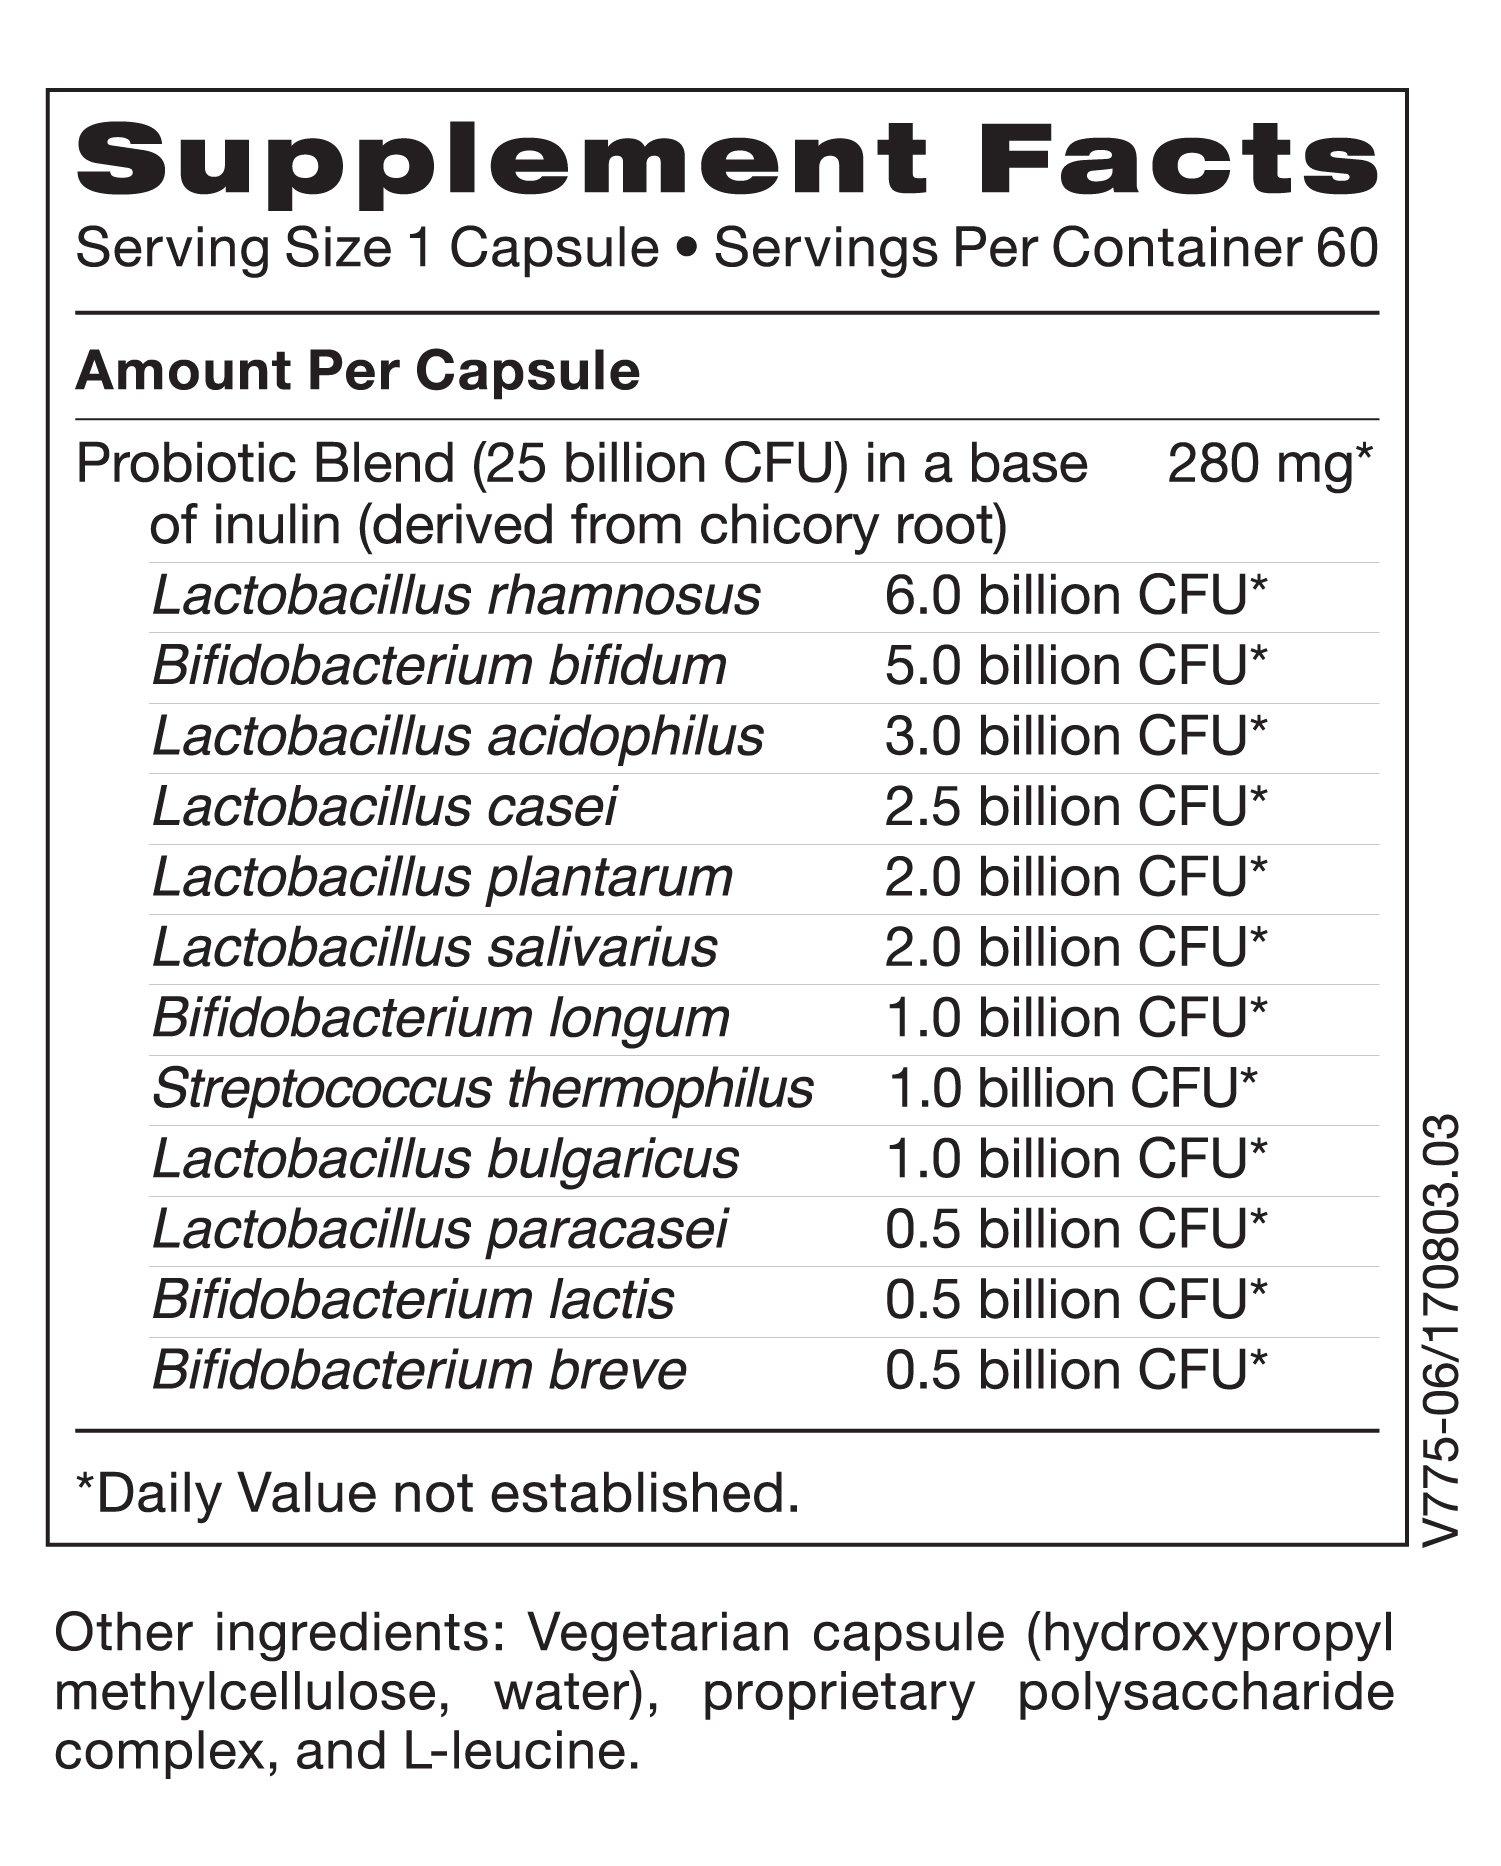 Klaire Labs Ther-Biotic Complete Probiotic - 25 Billion High CFU Blend, The Original Hypoallergenic Probiotic for Men & Women, Dairy-Free (60 Capsules) by Klaire Labs (Image #6)